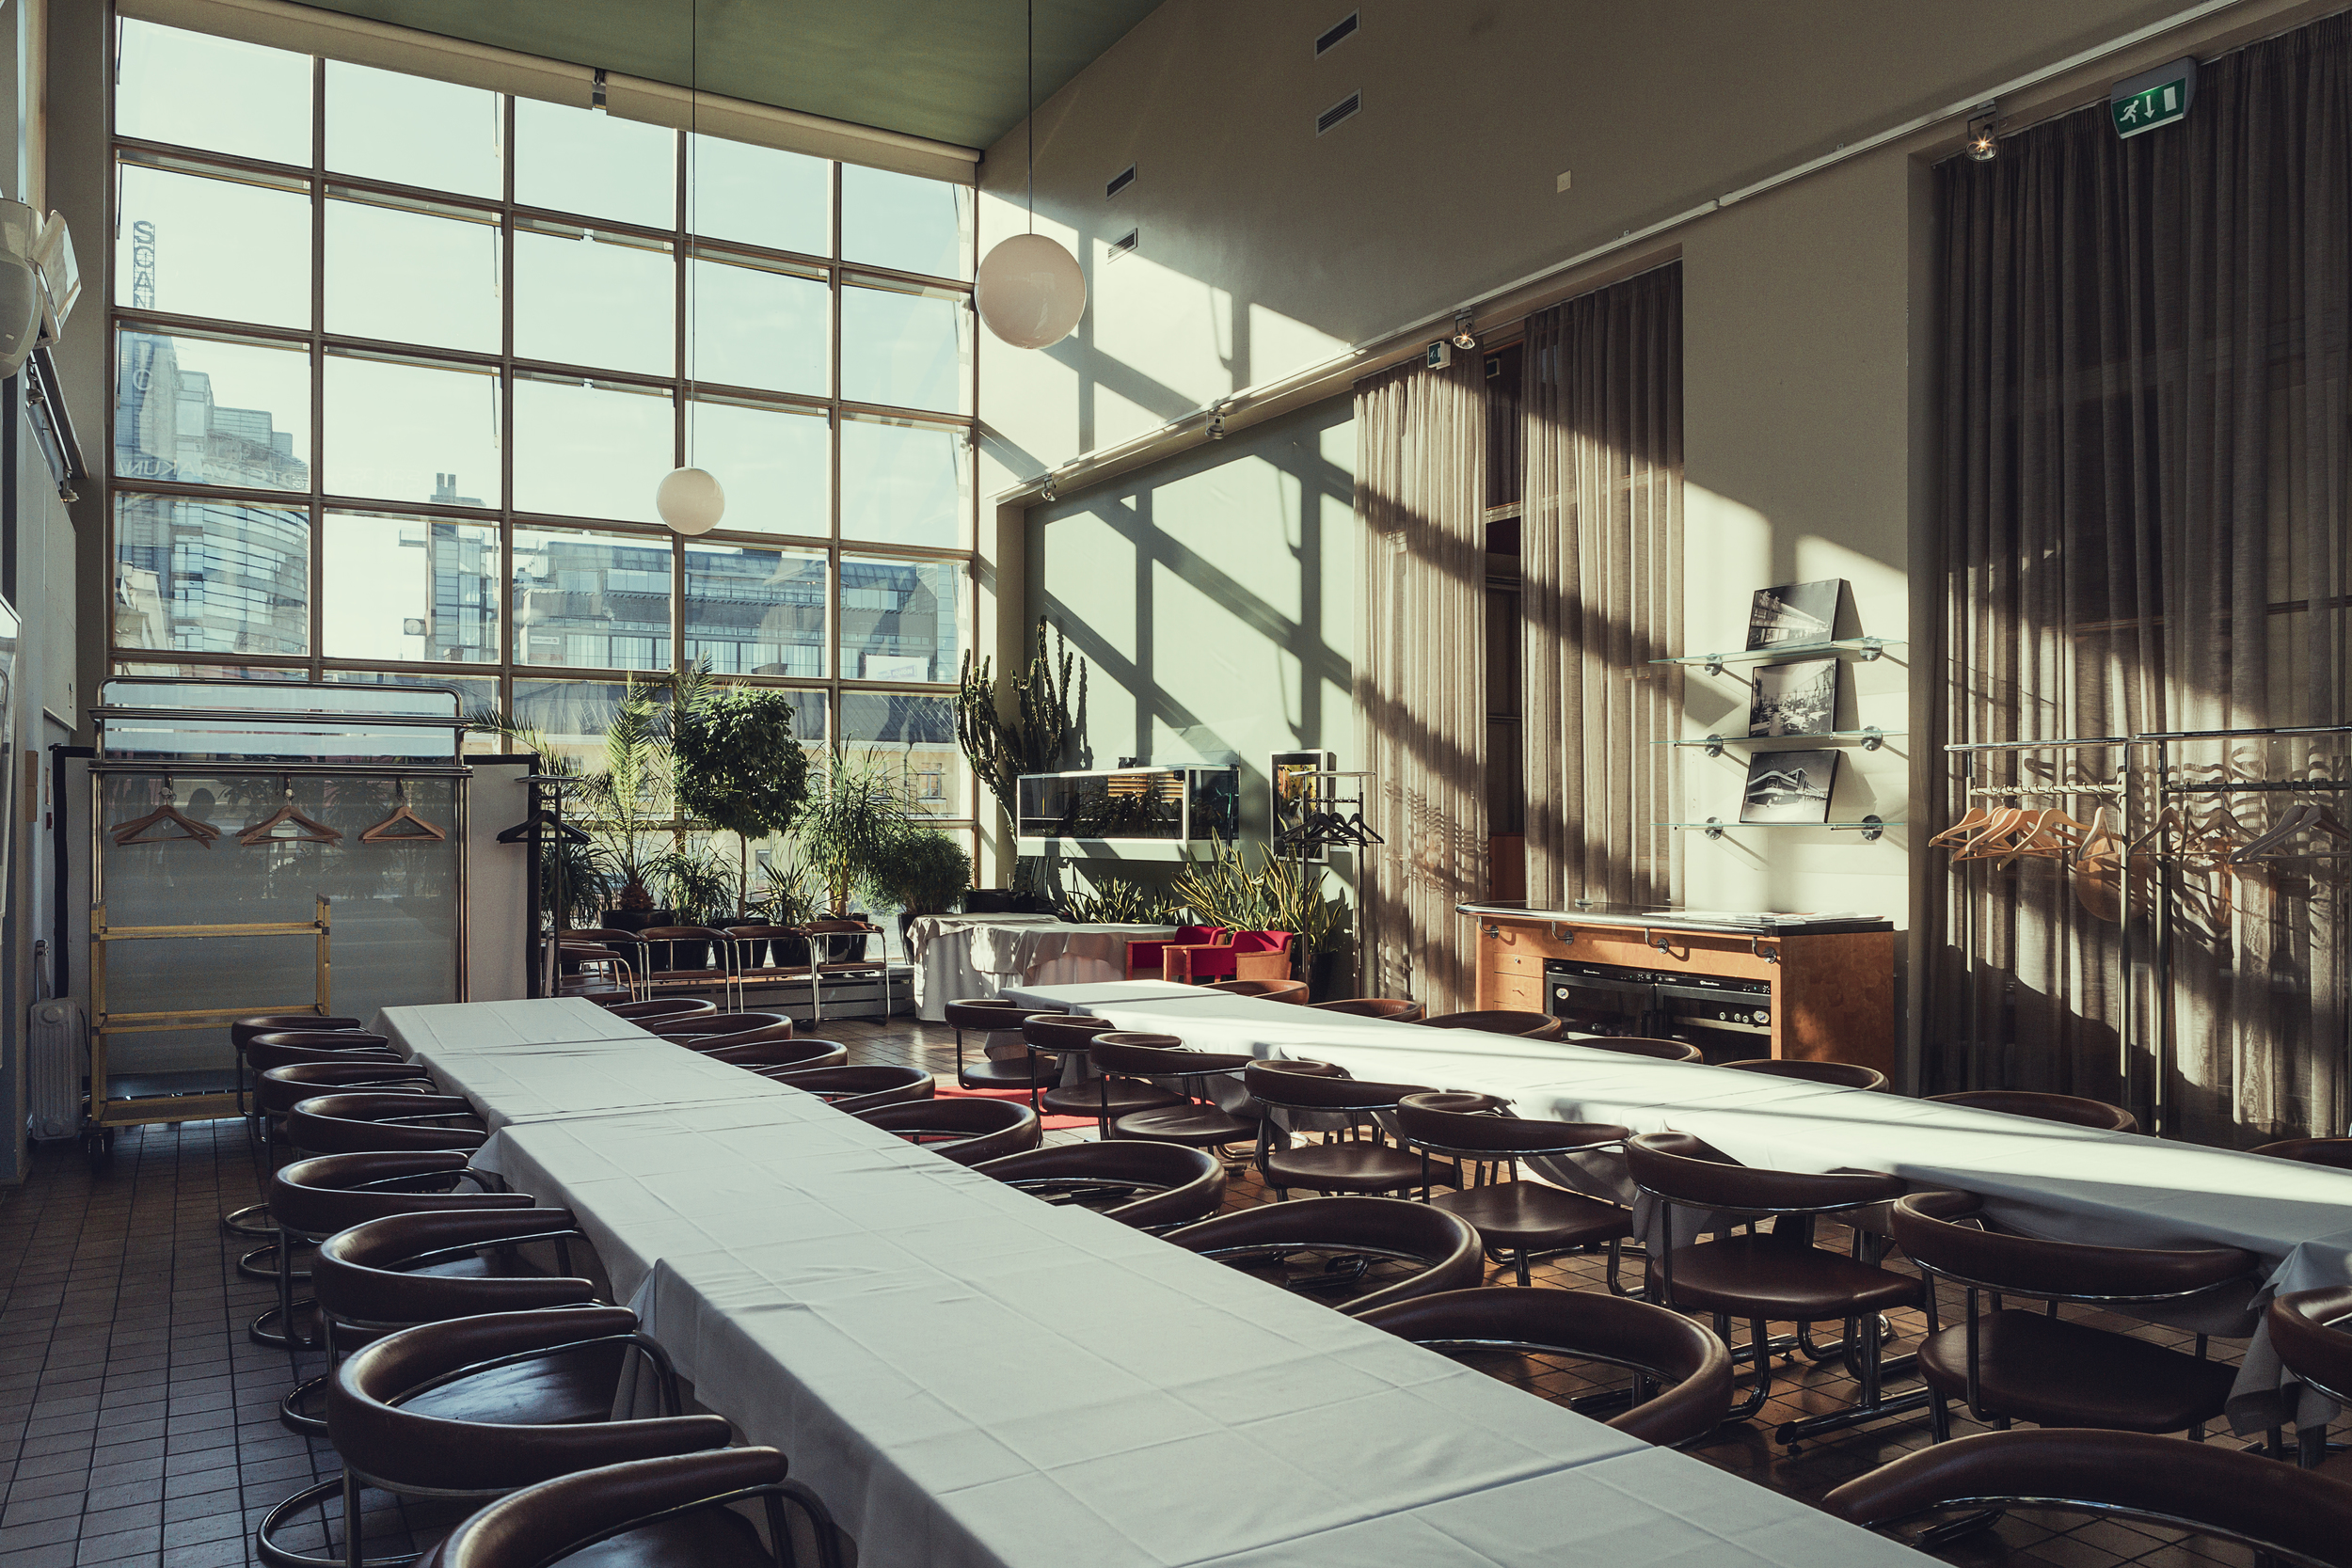 Restaurant Lasipalatsi conference room